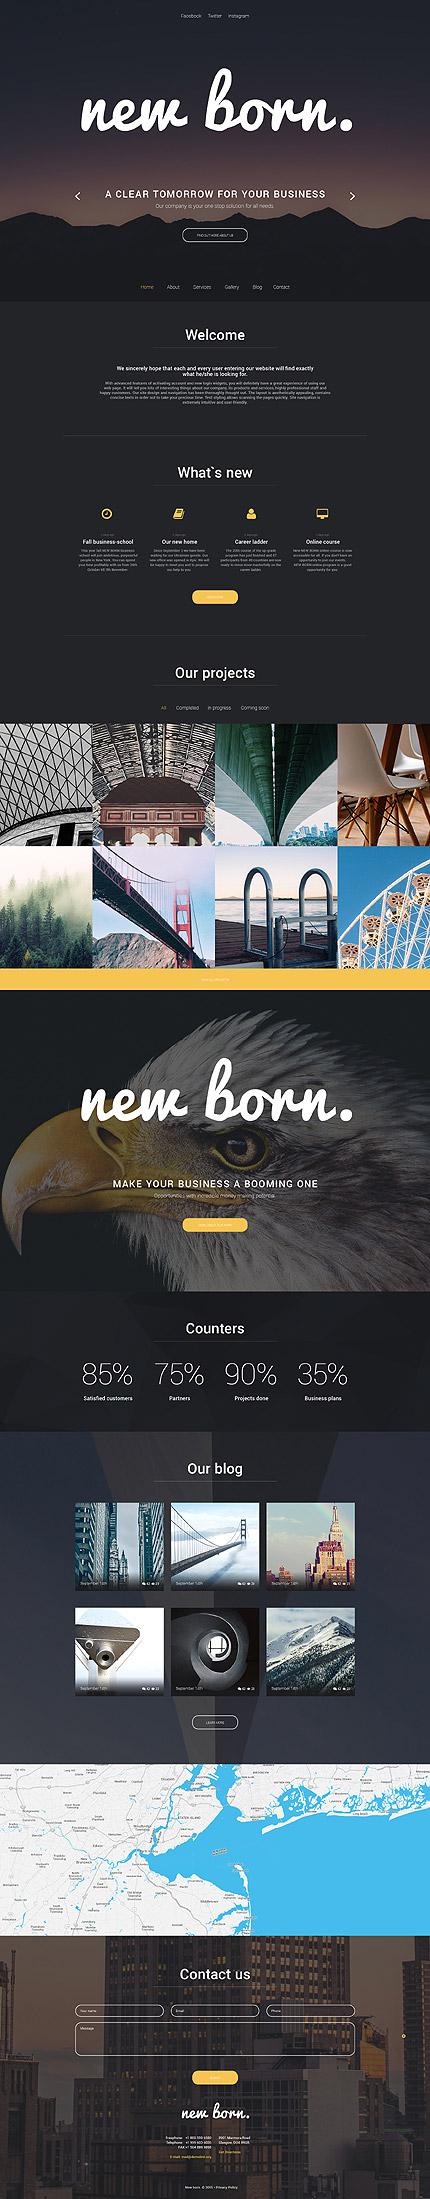 WordPress Theme/Template 56024 Main Page Screenshot